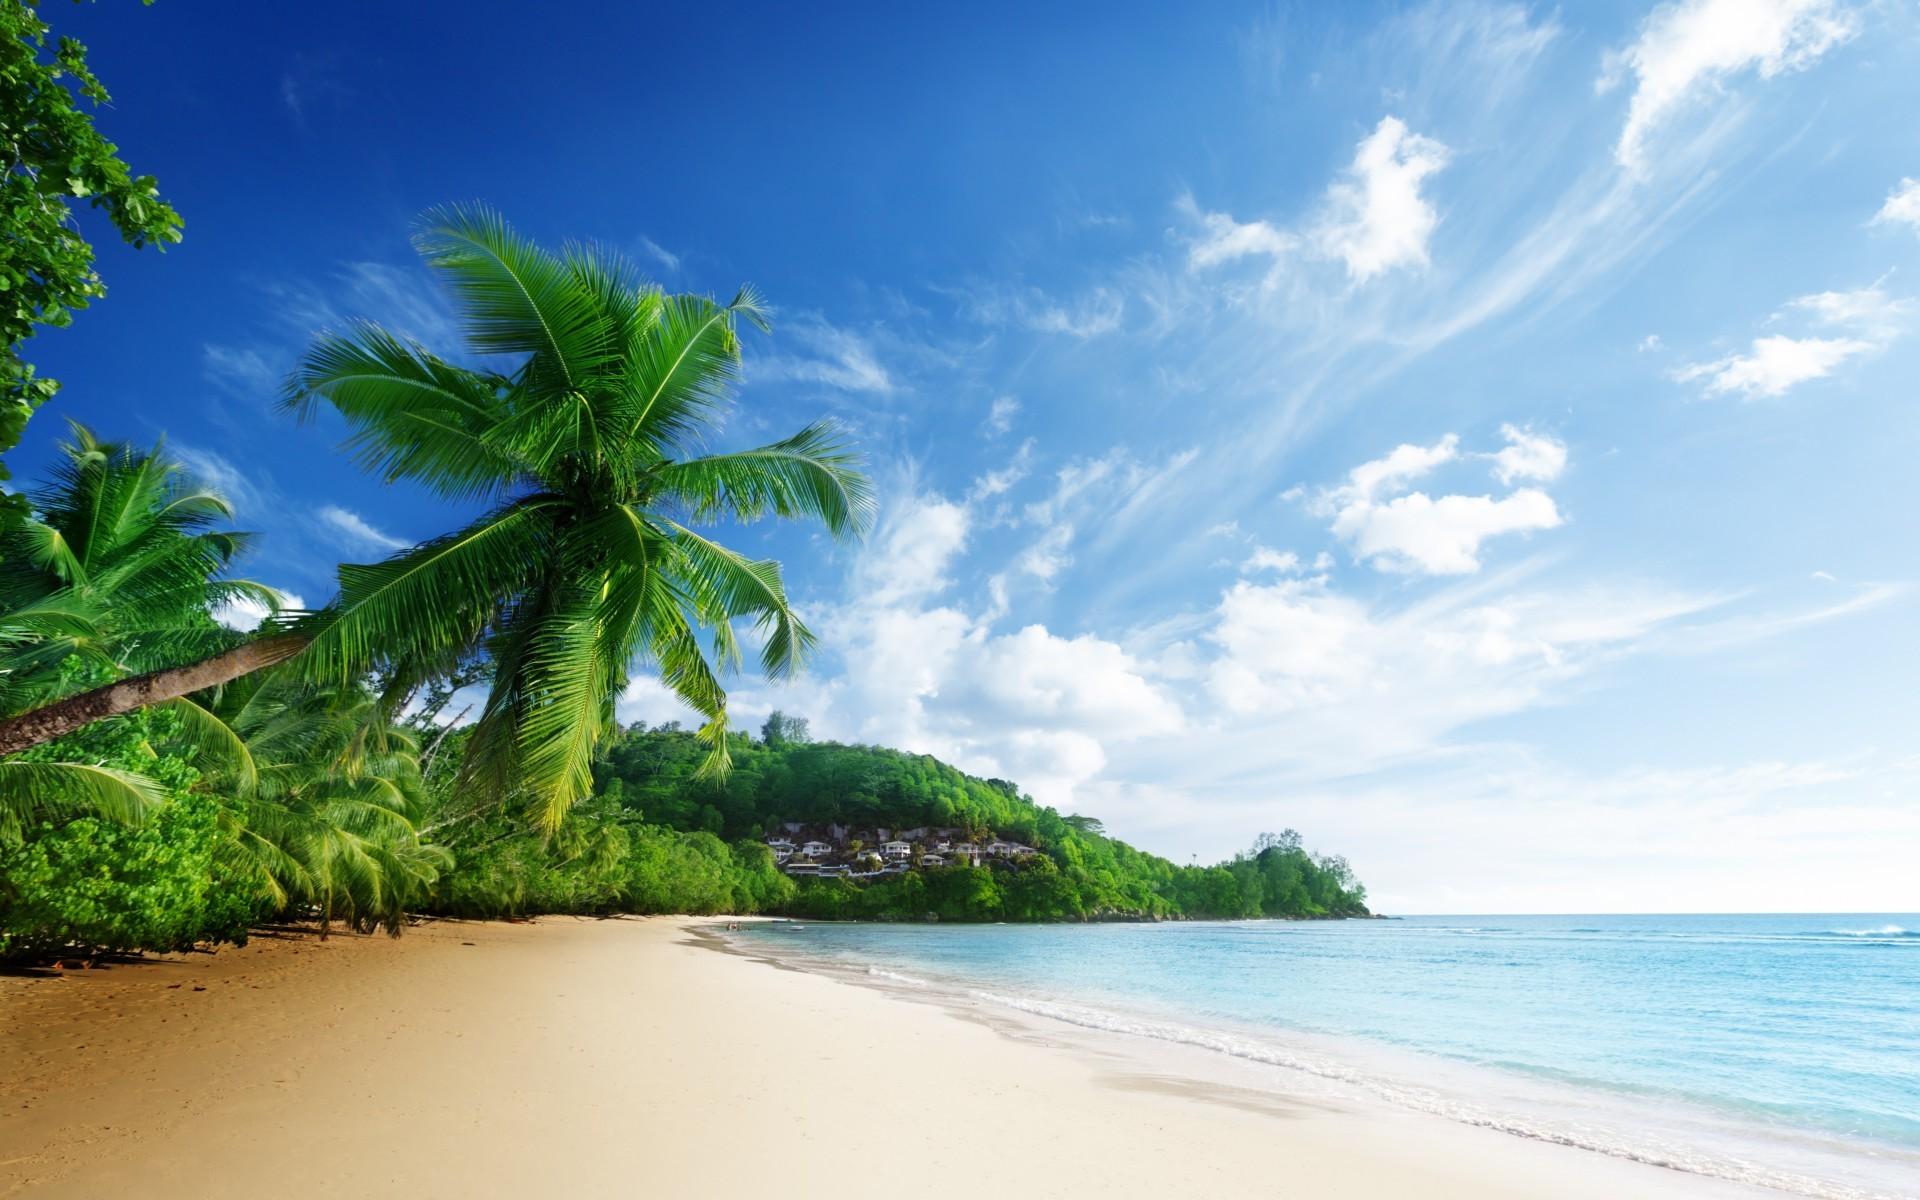 scenery sea beach sky clouds palm trees ocean tropical wallpaper .